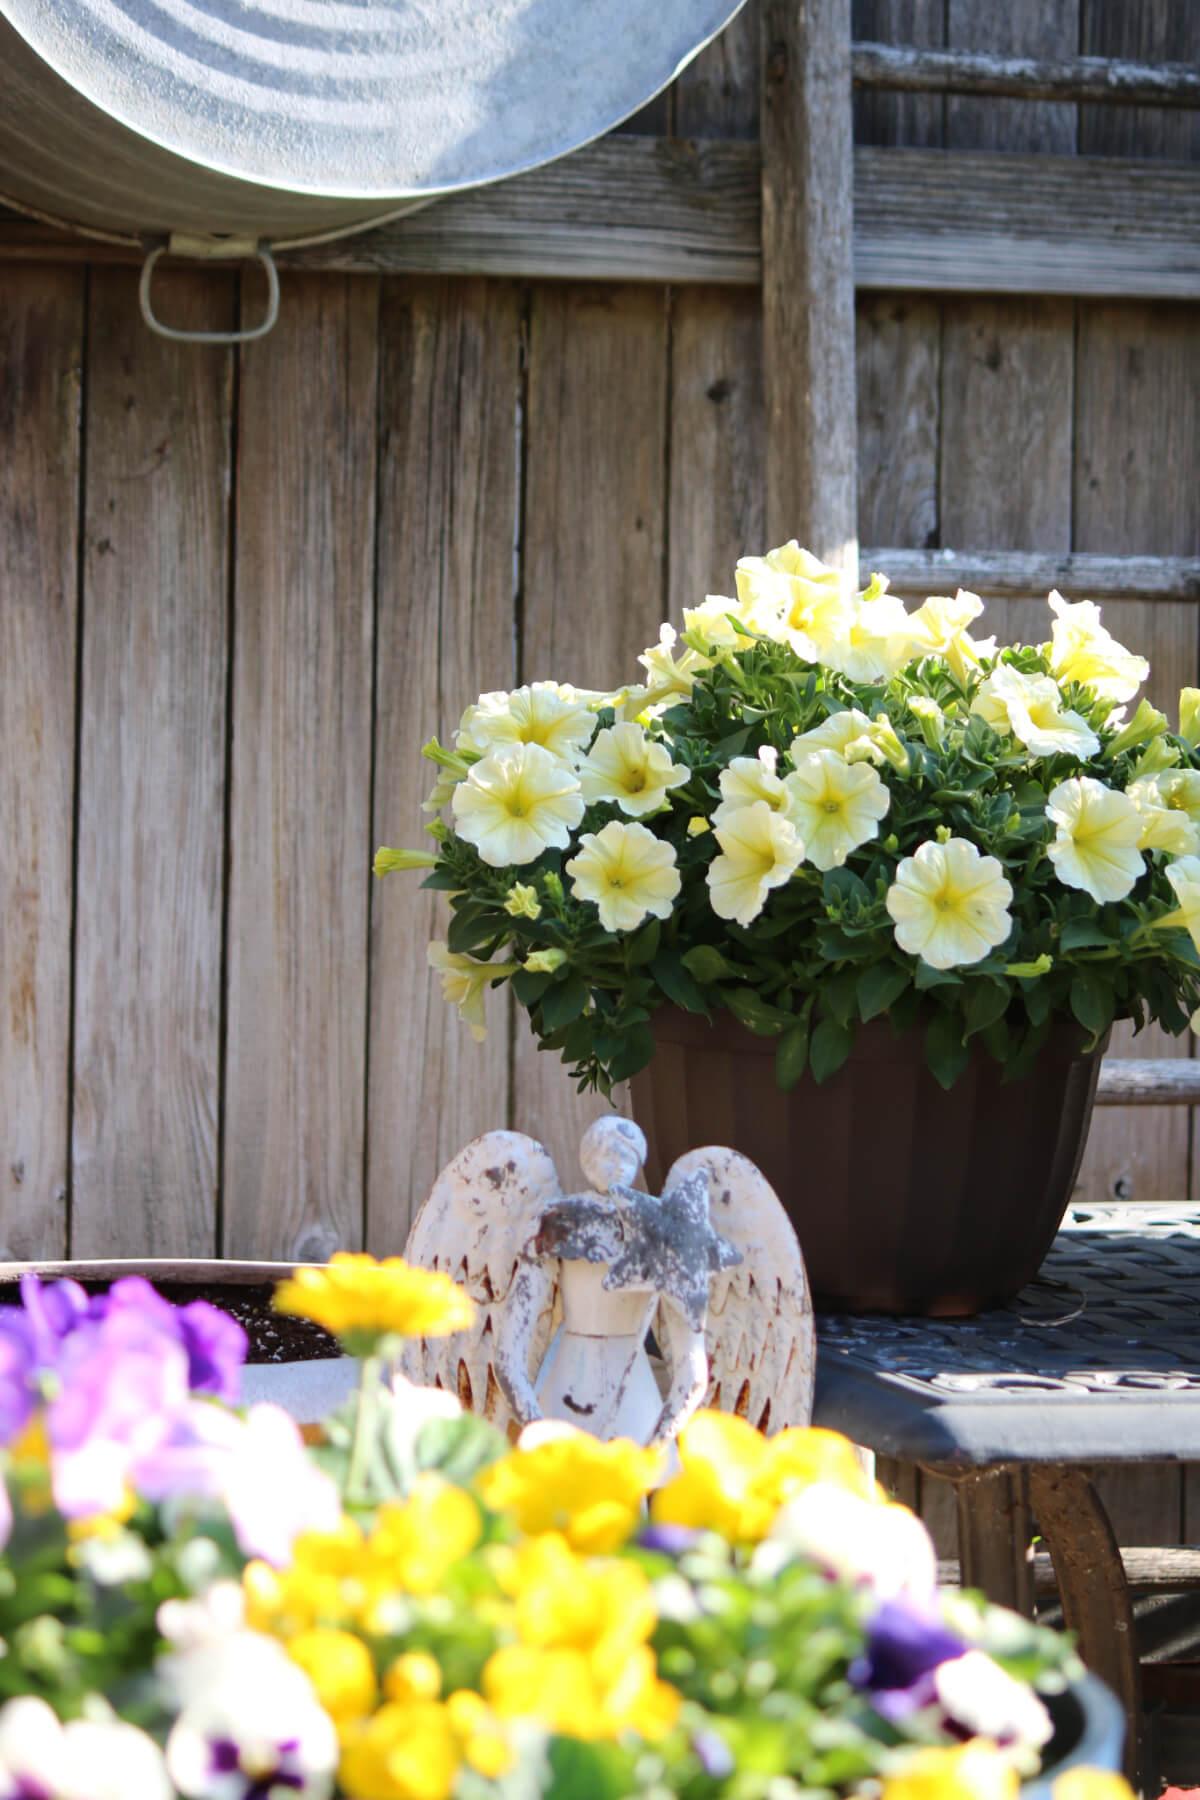 7 Mental Health Benefits Of Gardening